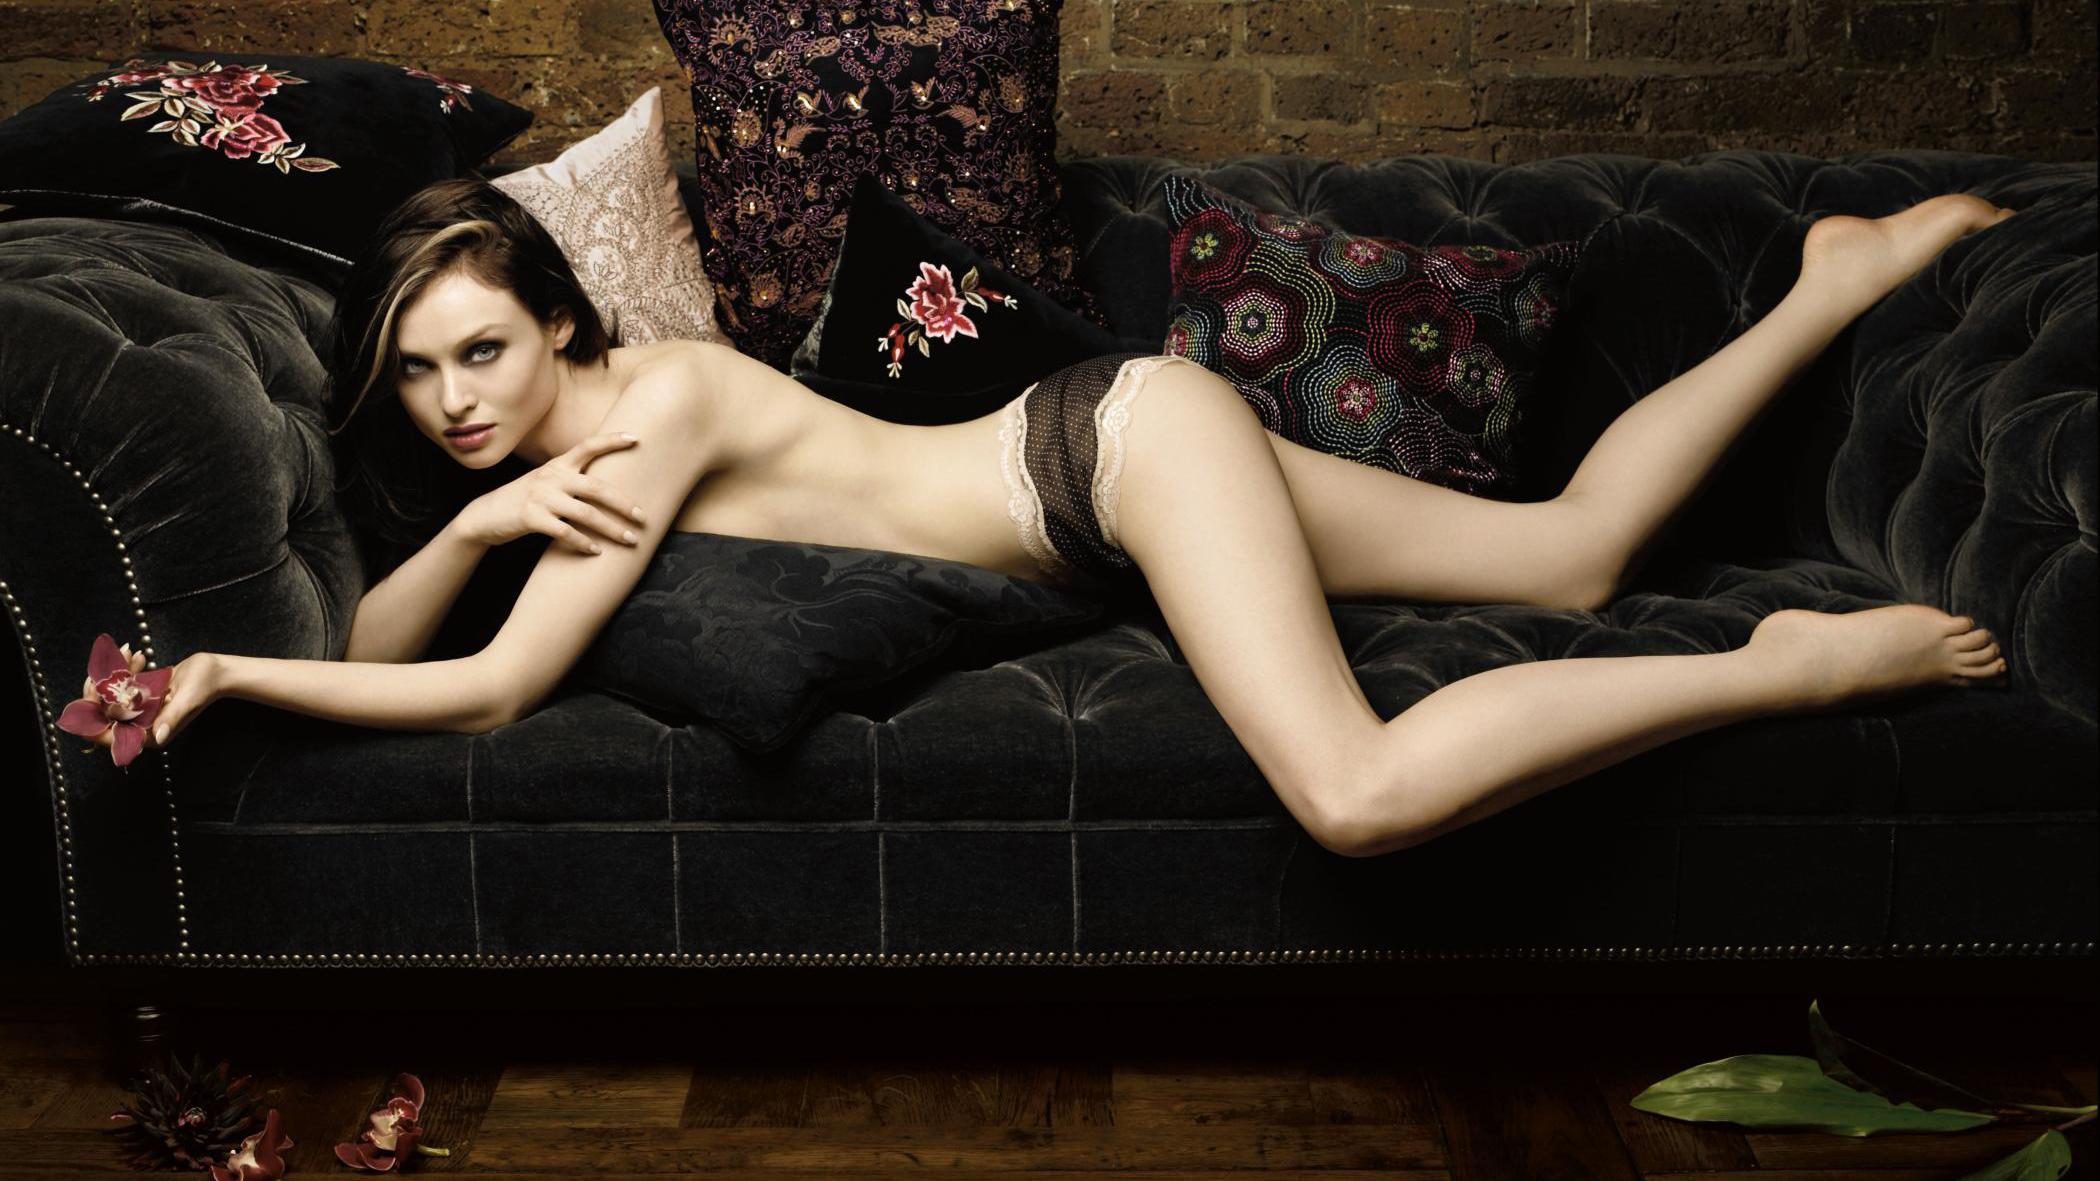 People 2100x1181 Sophie Ellis-Bextor lying on front couch topless singer British women tiptoe legs ass